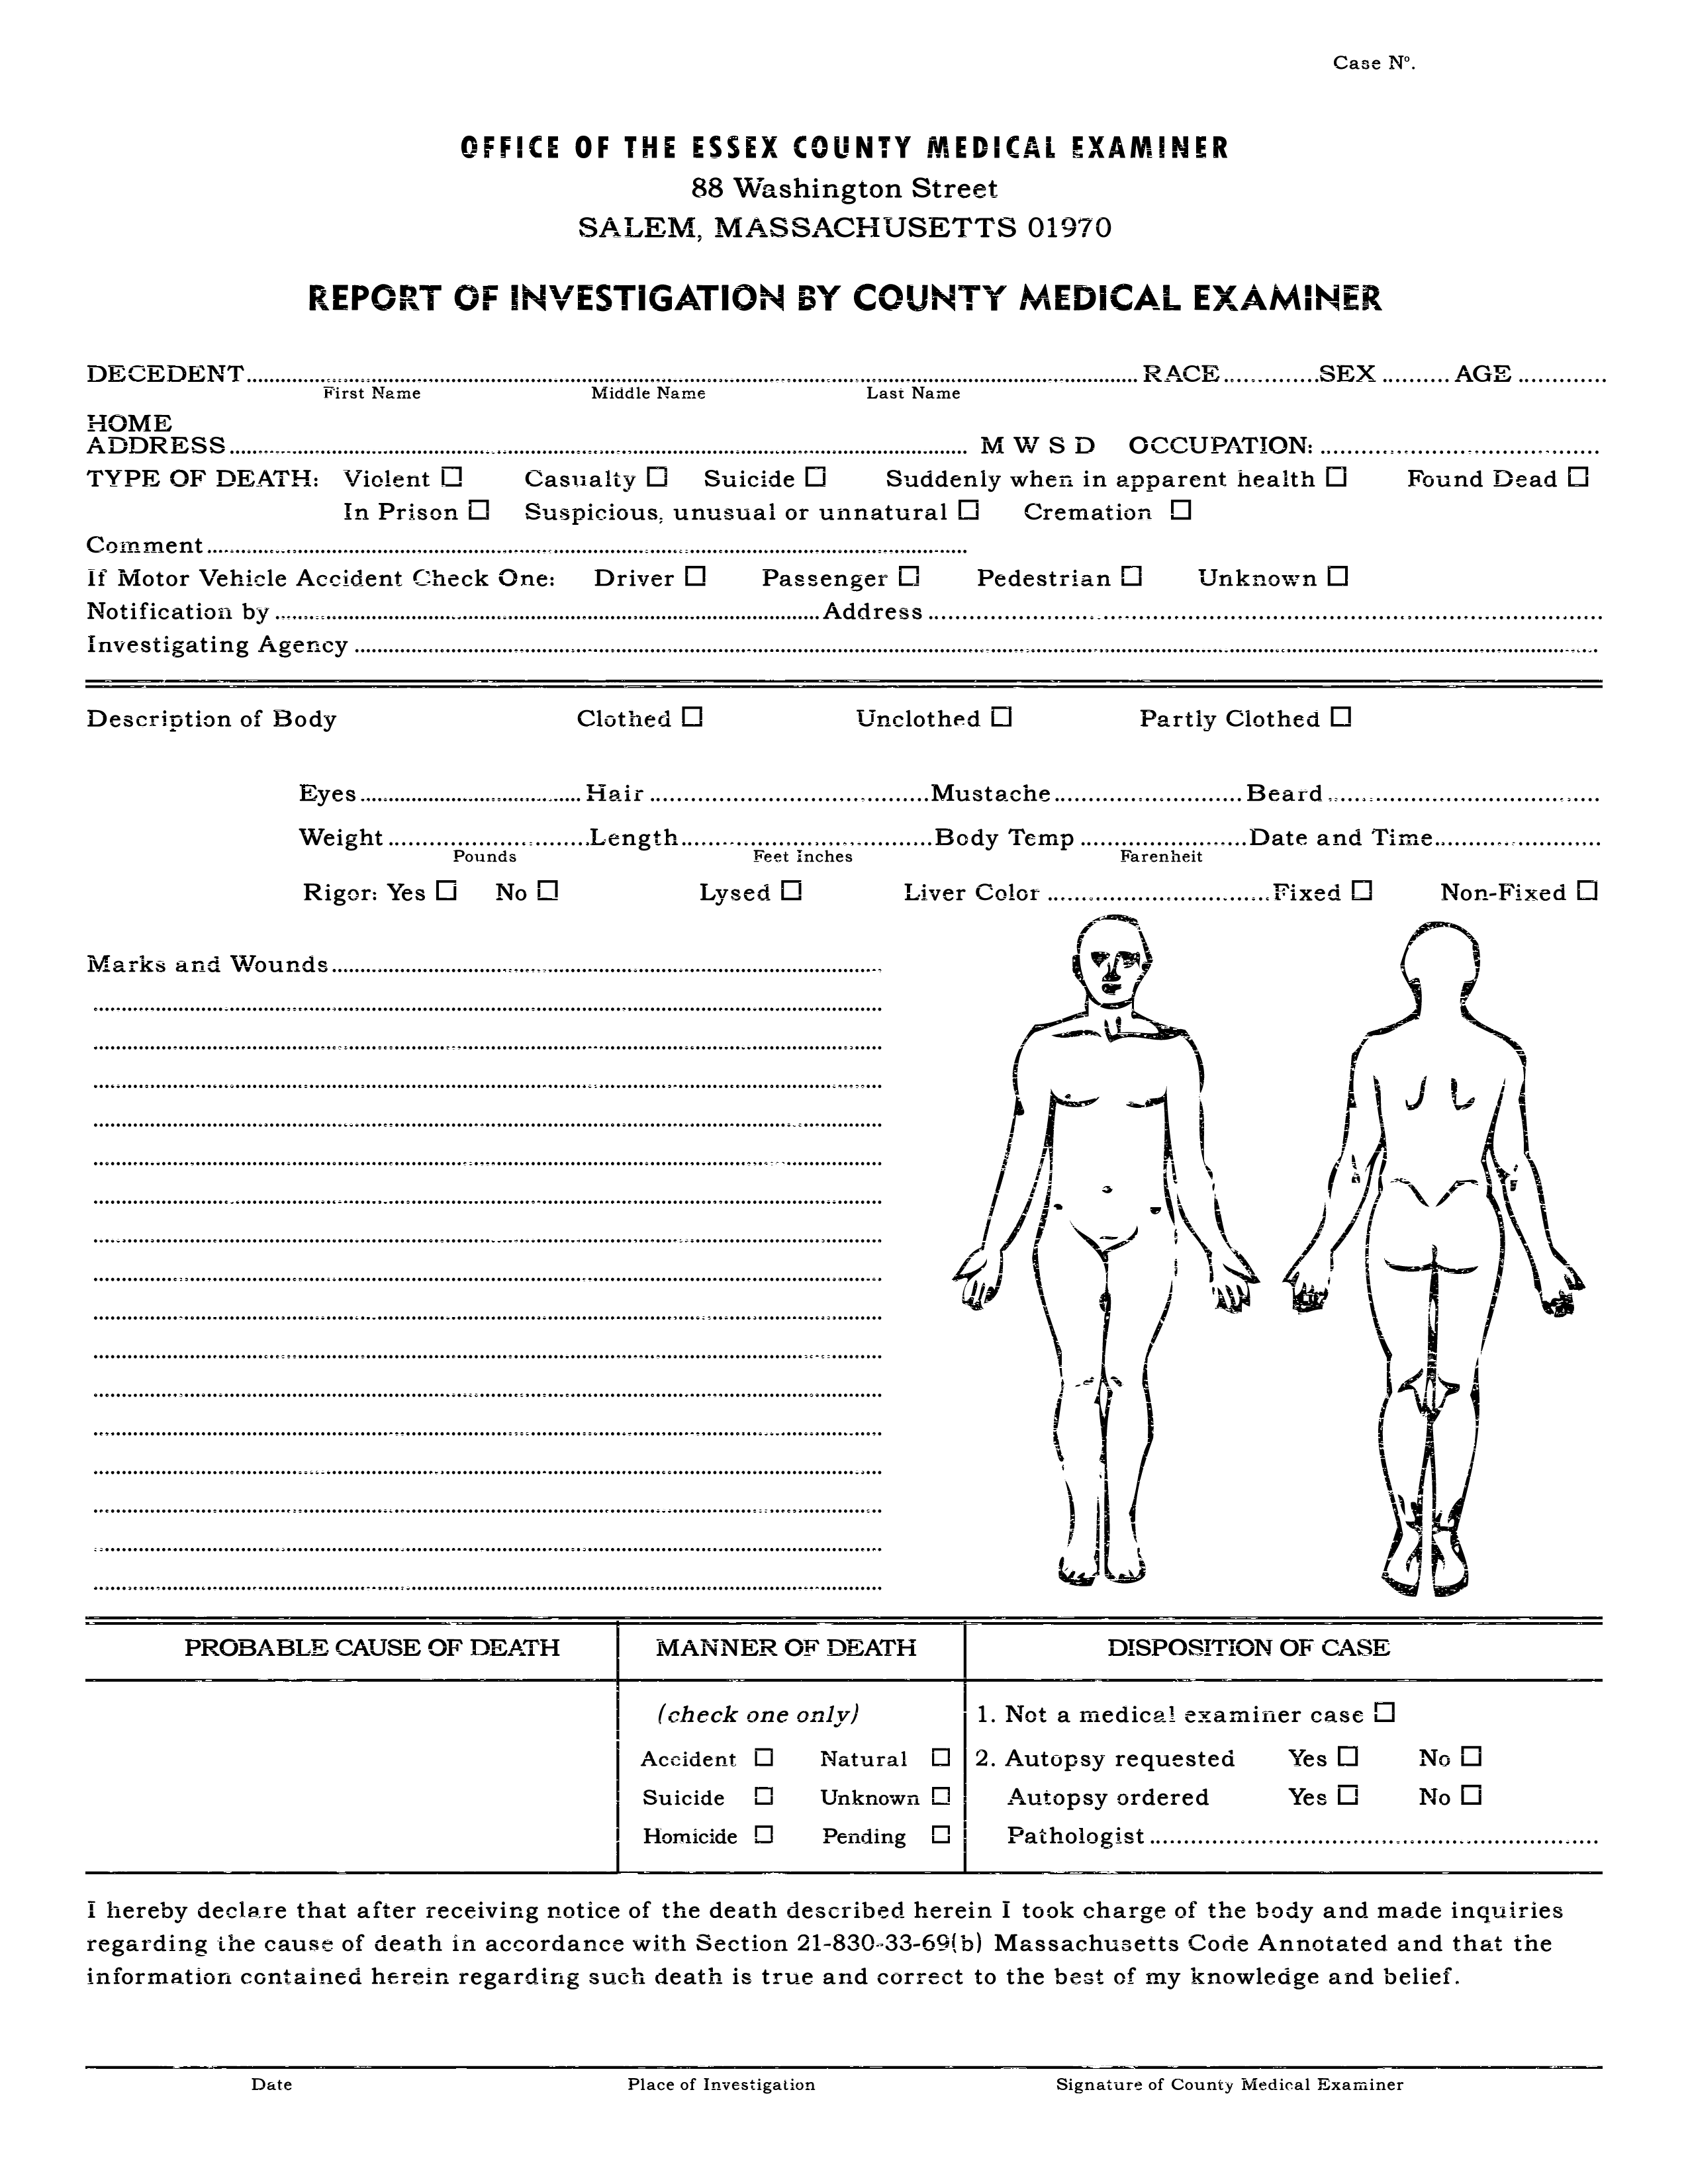 Dead clipart autopsy. Downloads cthulhu reborn miscellaneous